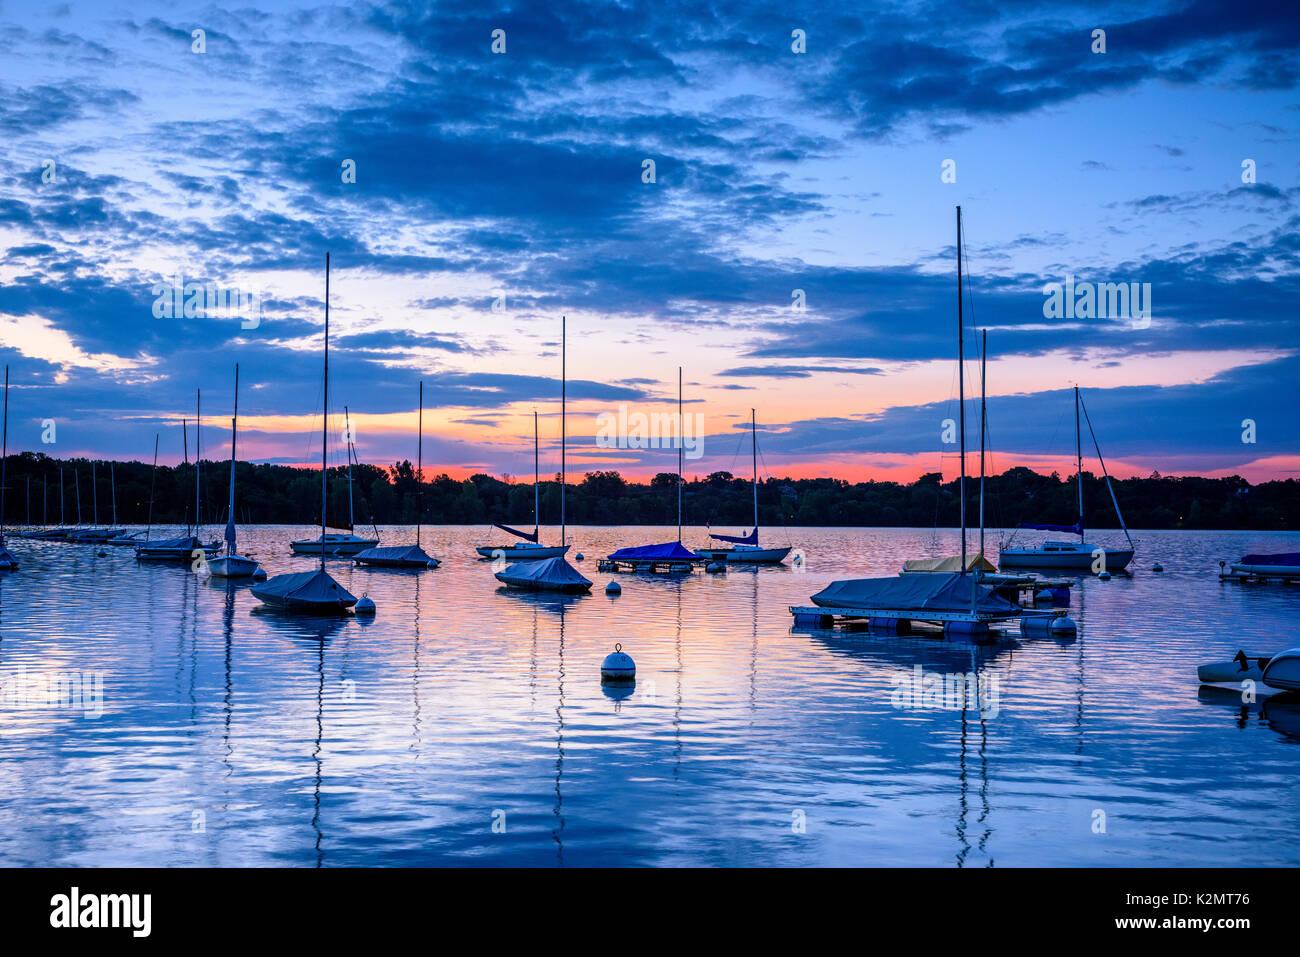 Sailboats at dawn on Lake Harriet in Minneapolis, Minnesota. - Stock Image